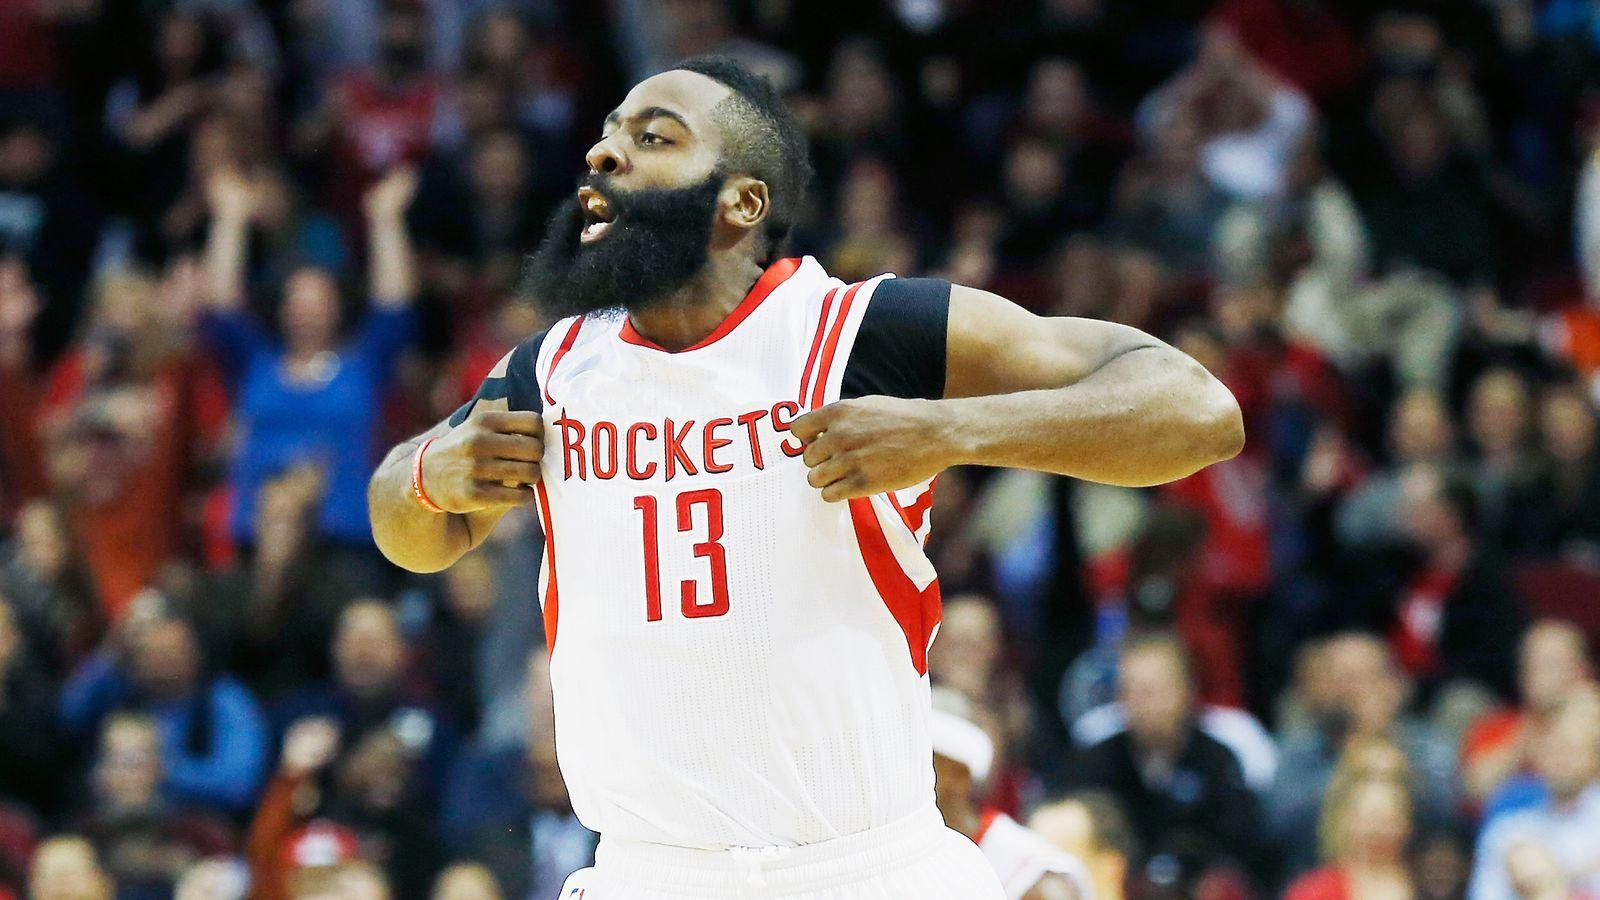 Can James Harden actually win the MVP? - The Dream Shake